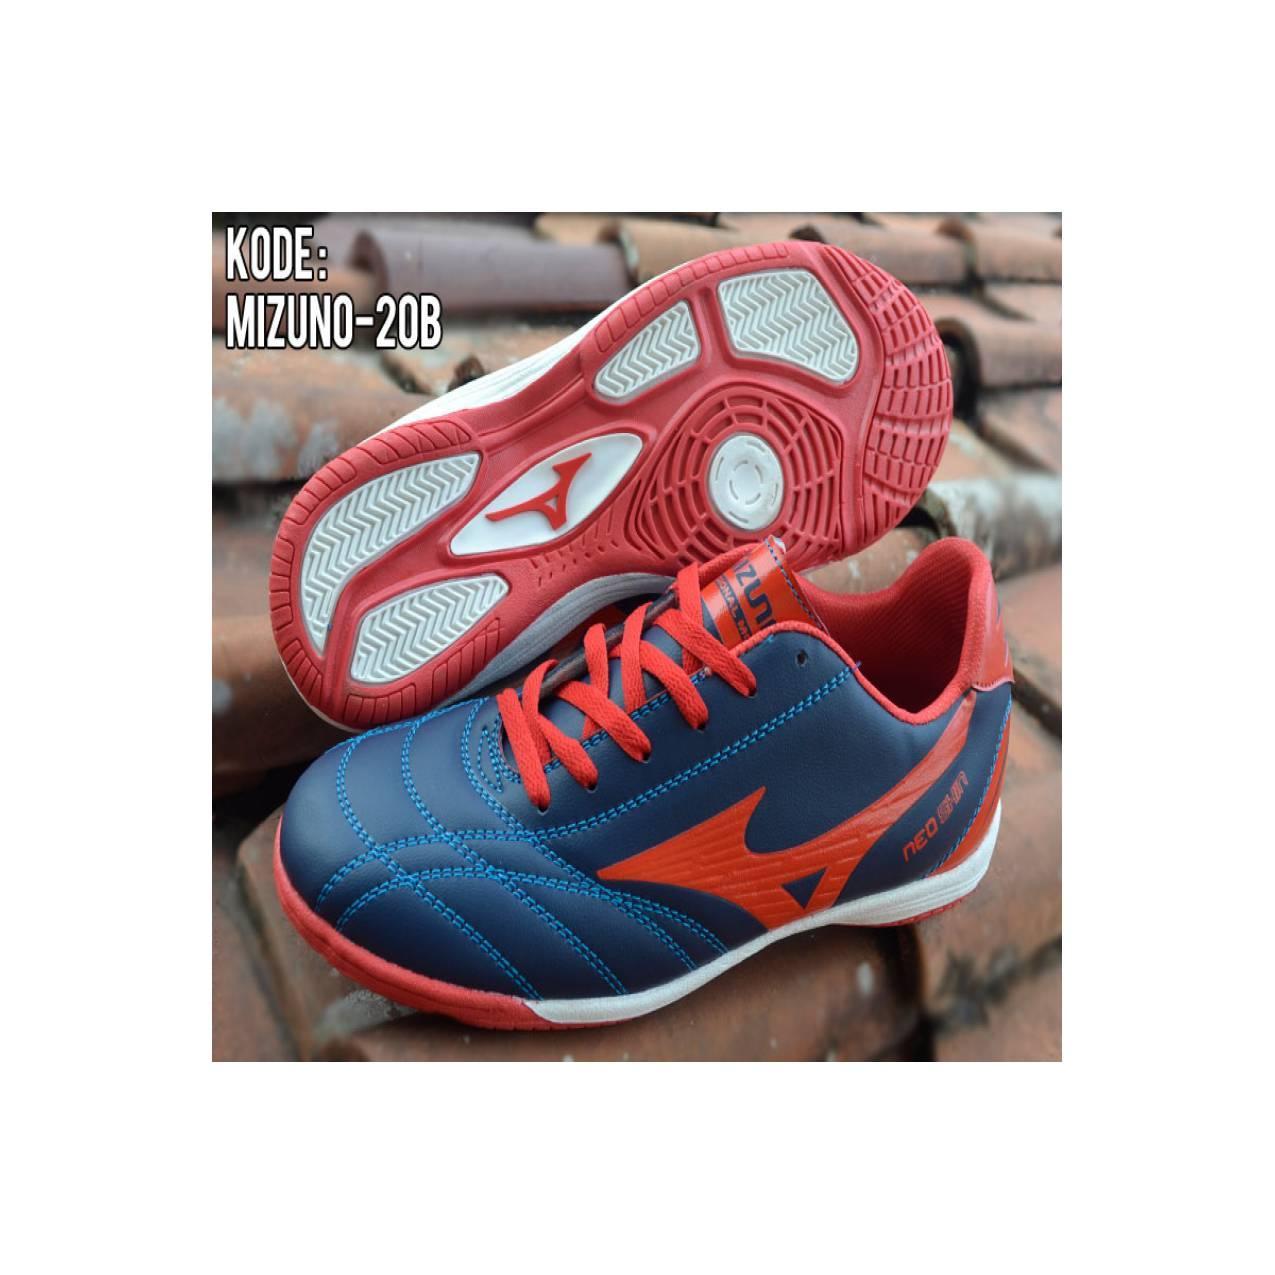 Sepatu Futsal Mizuno KW 1 Kode Mizuno 20B